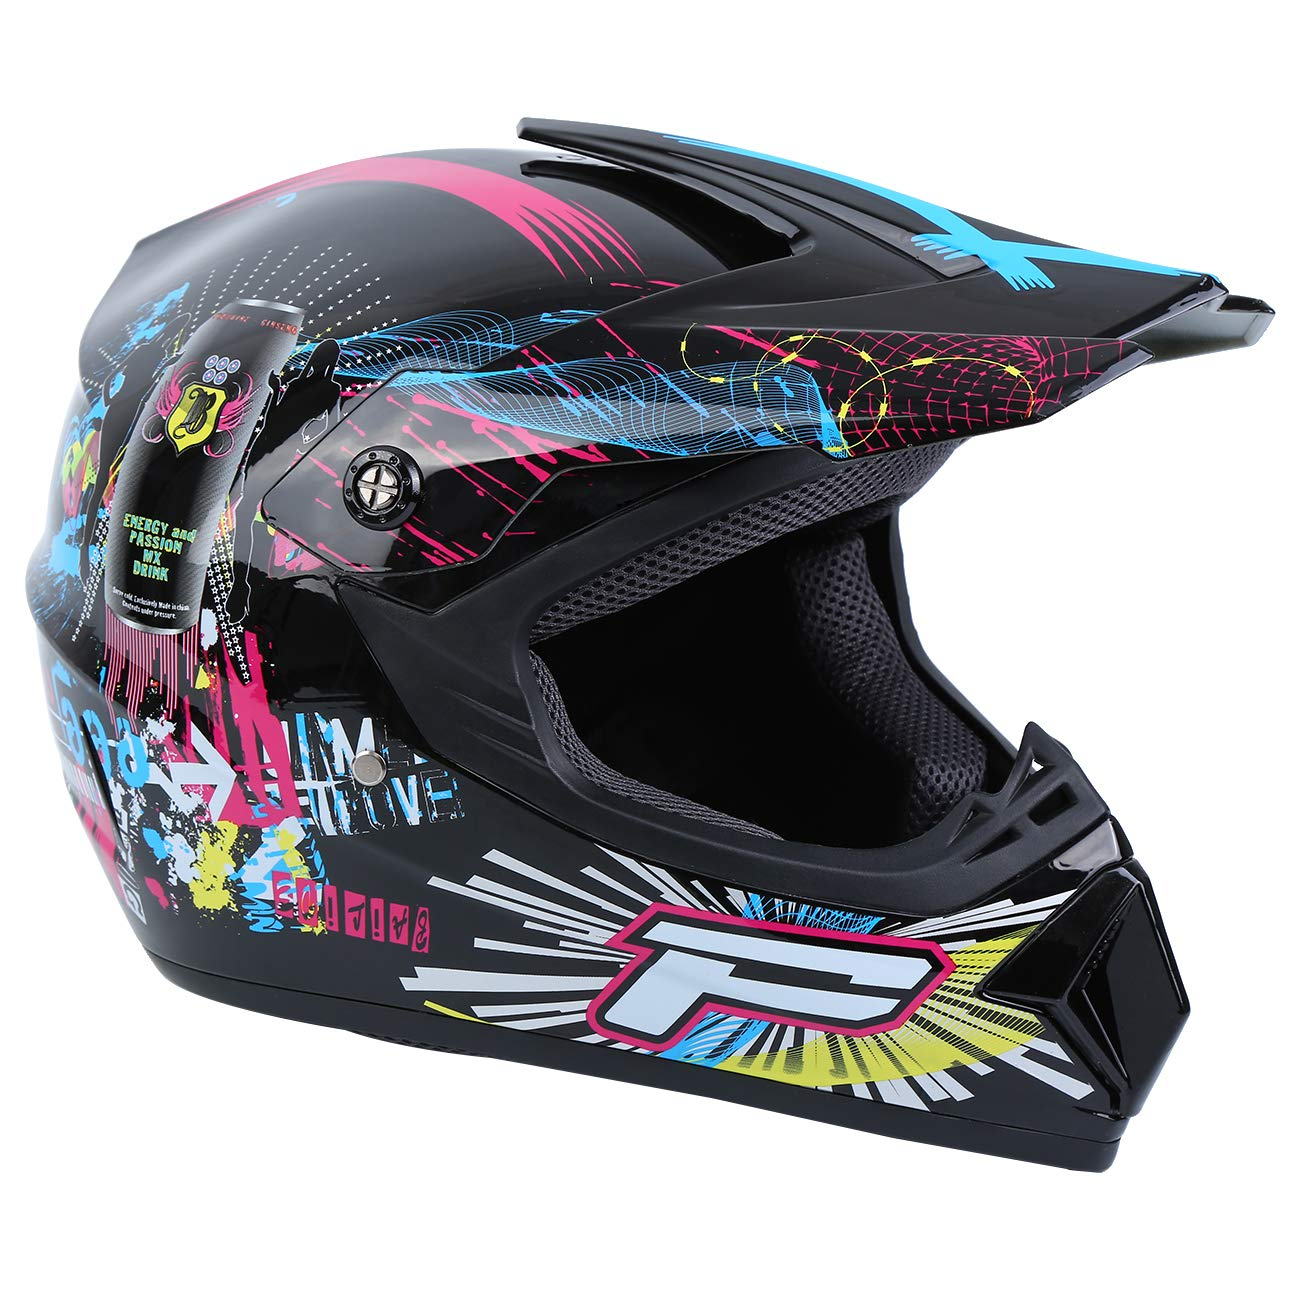 Jaune, L Samger Dot Adulte Casque Hors Route Casque Motocross Dirt Bike ATV Casque Moto Gants Lunettes